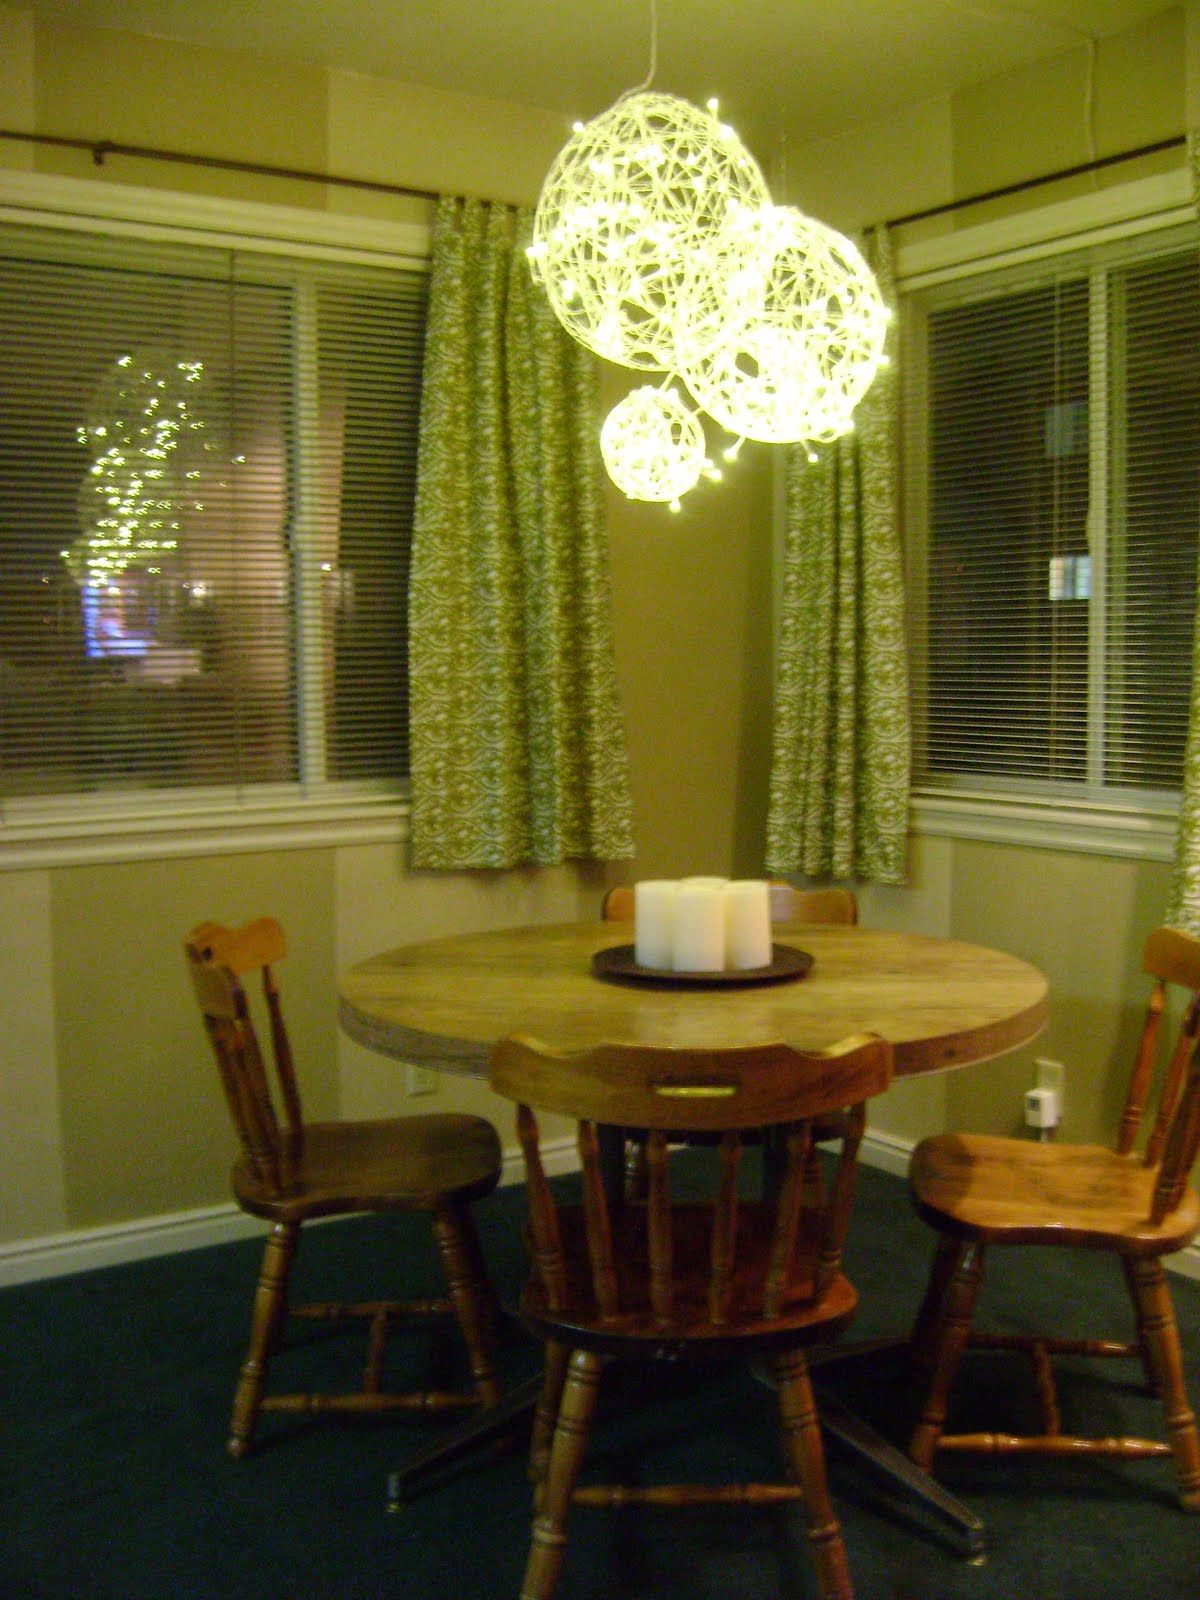 Wedding decoration ideas in the house  DIY Balloon u string chandelier  DIY  Pinterest  Chandeliers Fun